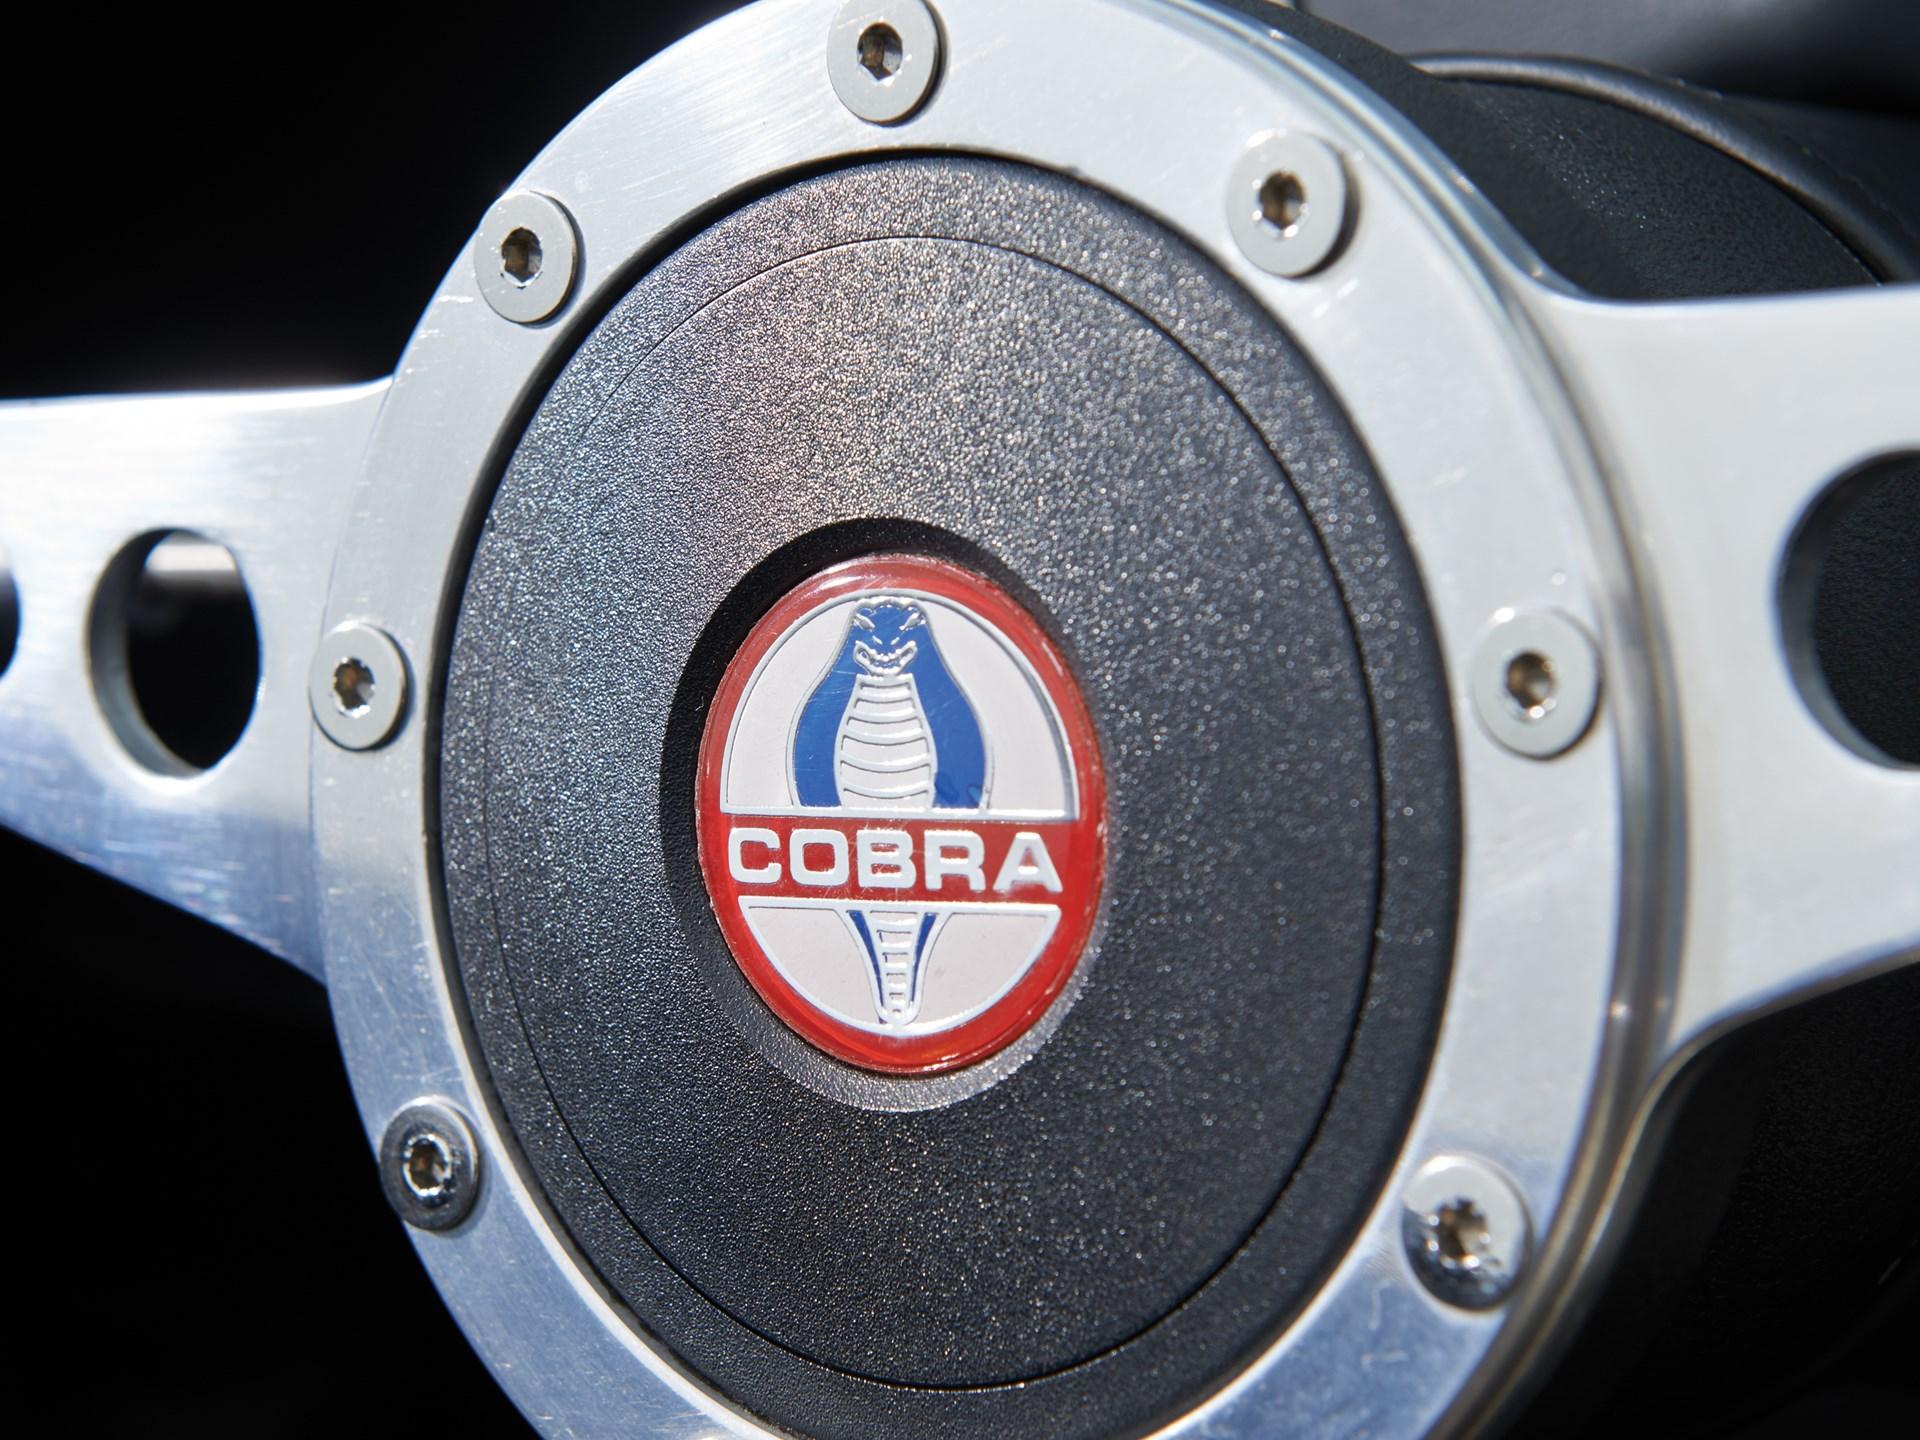 2005 Weineck Cobra 780 CUI Limited Edition